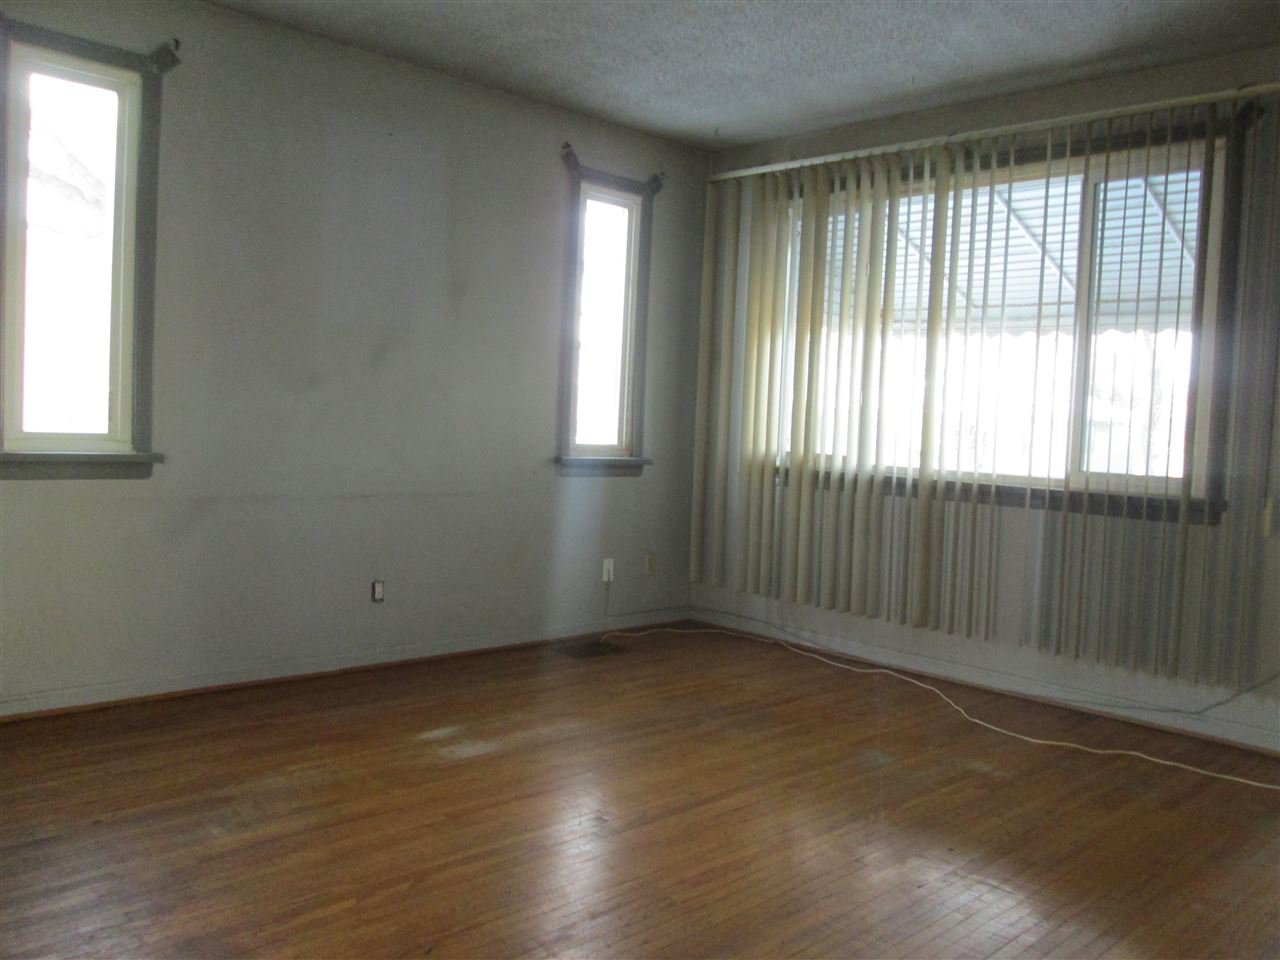 Main Photo: 11945 69 Street in Edmonton: Zone 06 House for sale : MLS®# E4183147